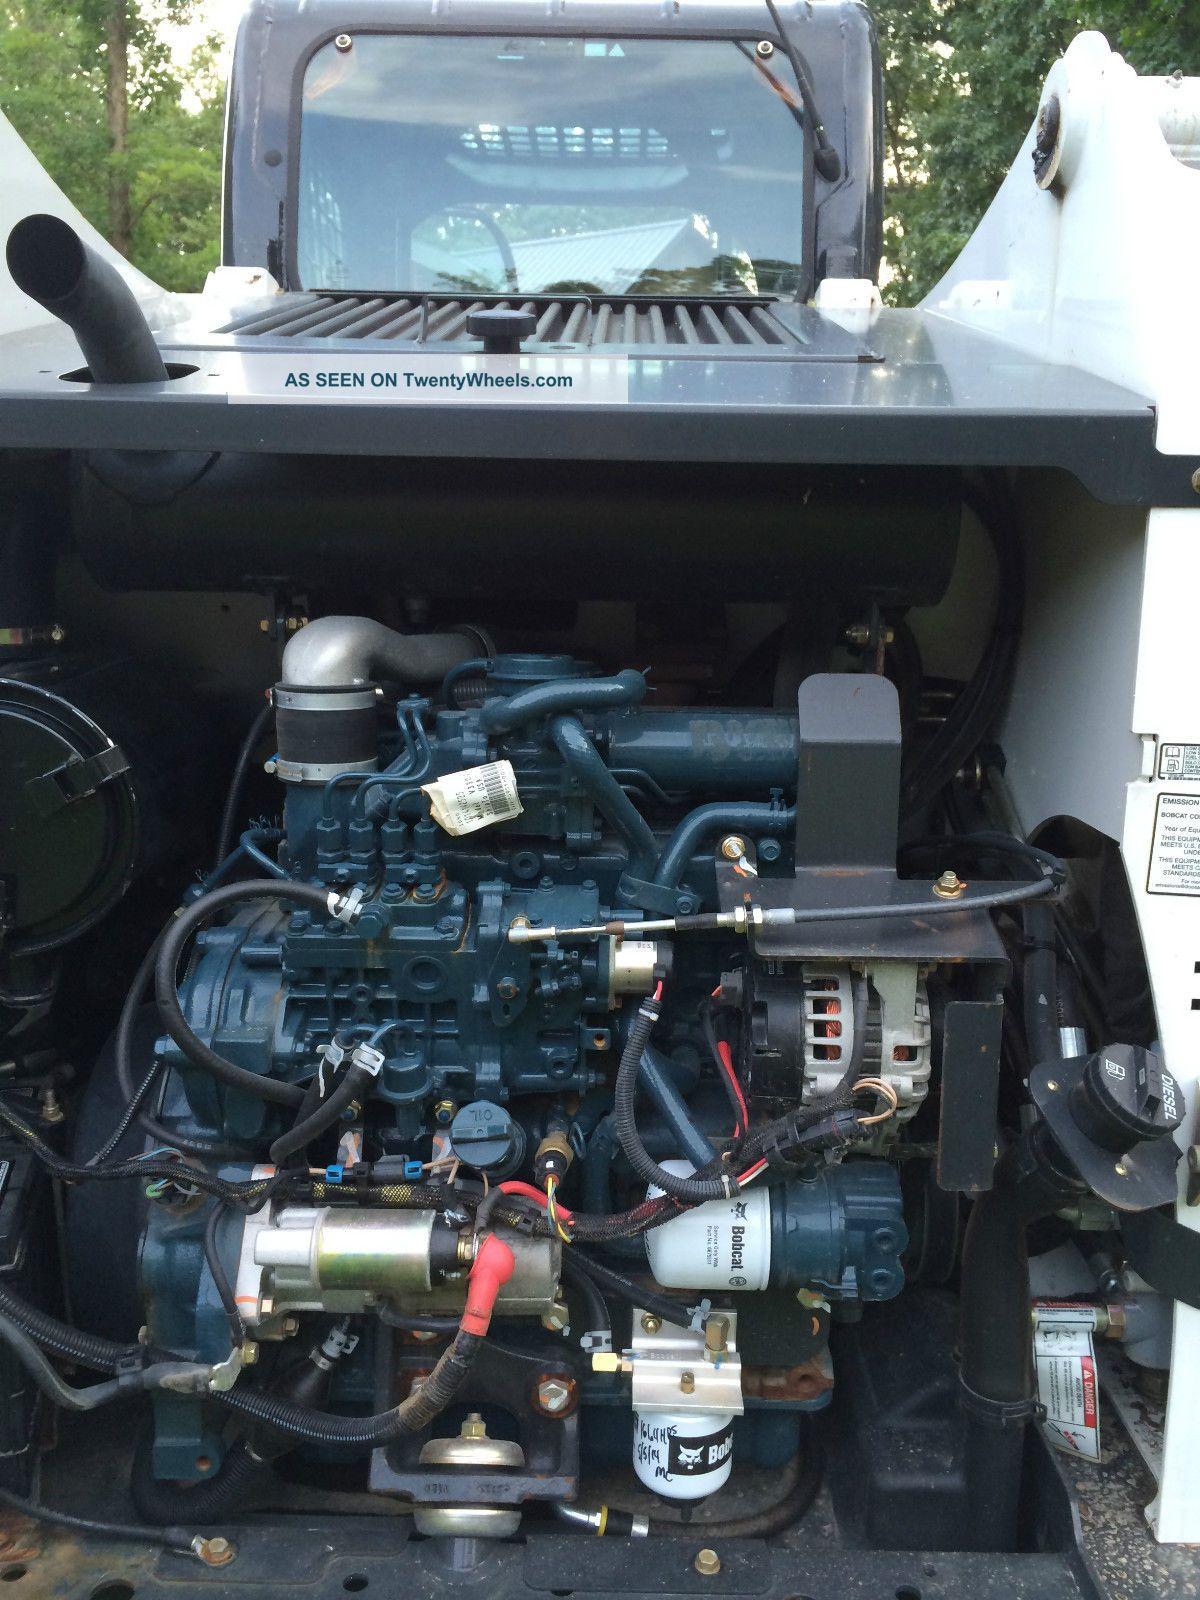 Bobcat T630 Skid Steer Track Loader Options Kubota Diesel Like Deere Cat